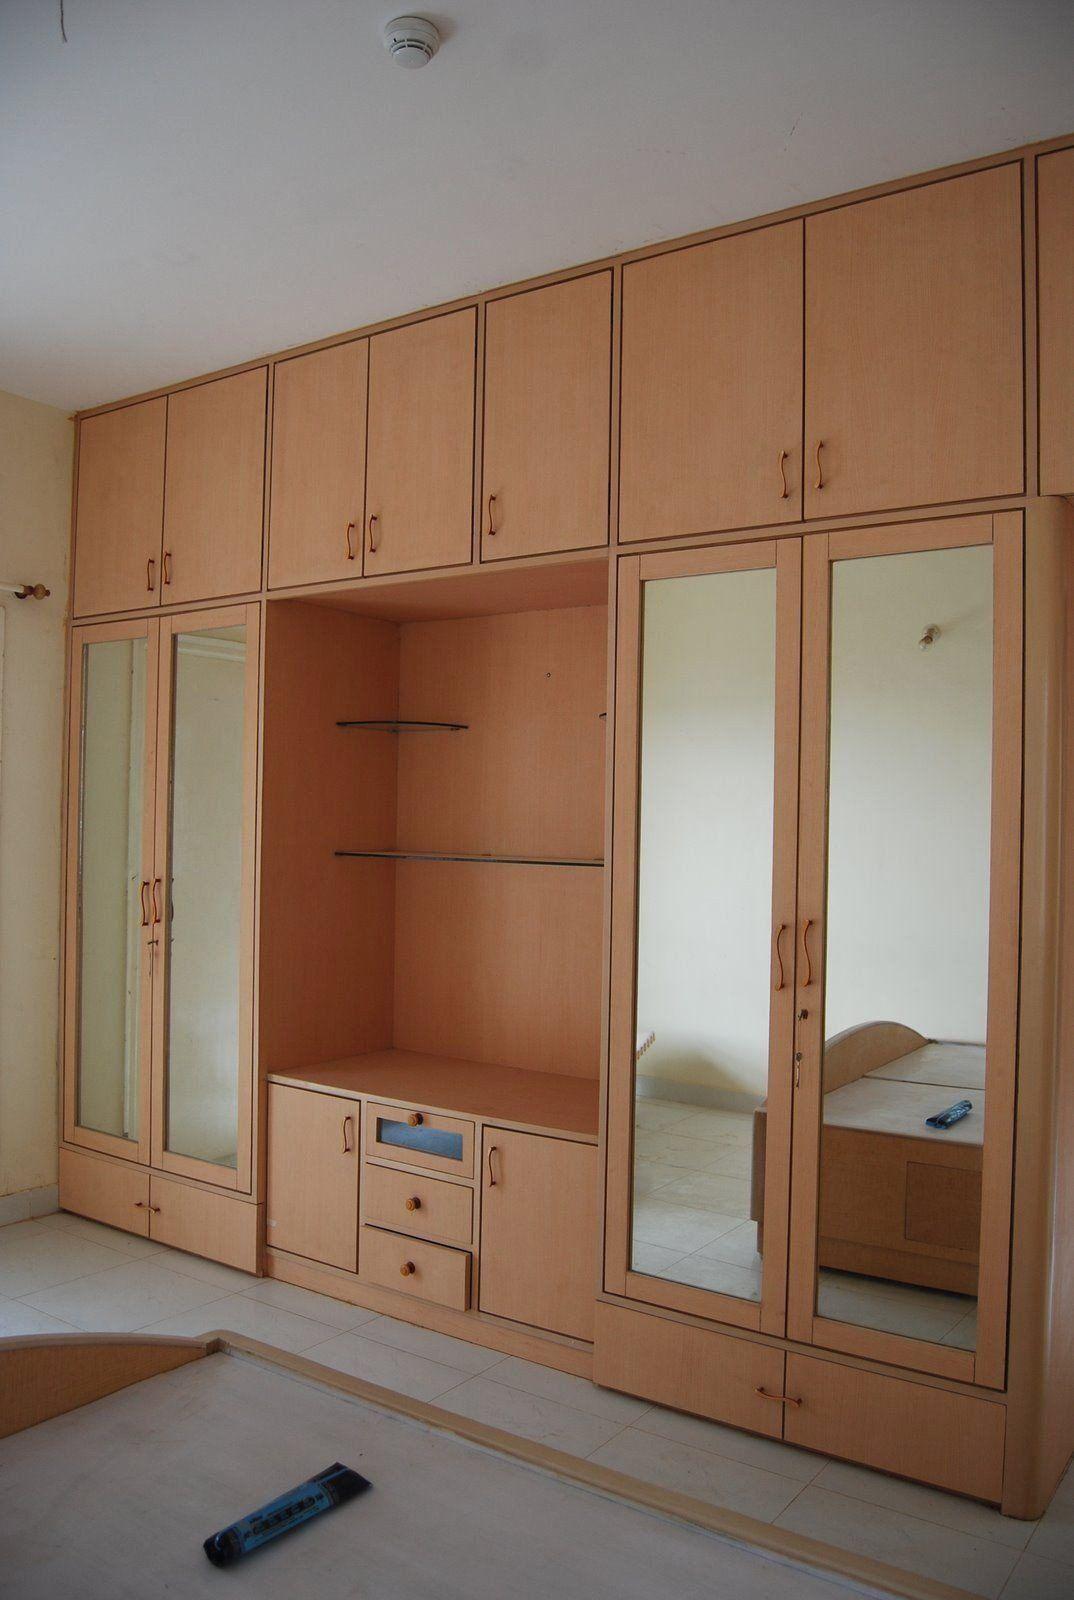 30 Almirah Wall Wardrobes To Offer You More Space Almirah Designs Color Bathroom Design Cupboard Design